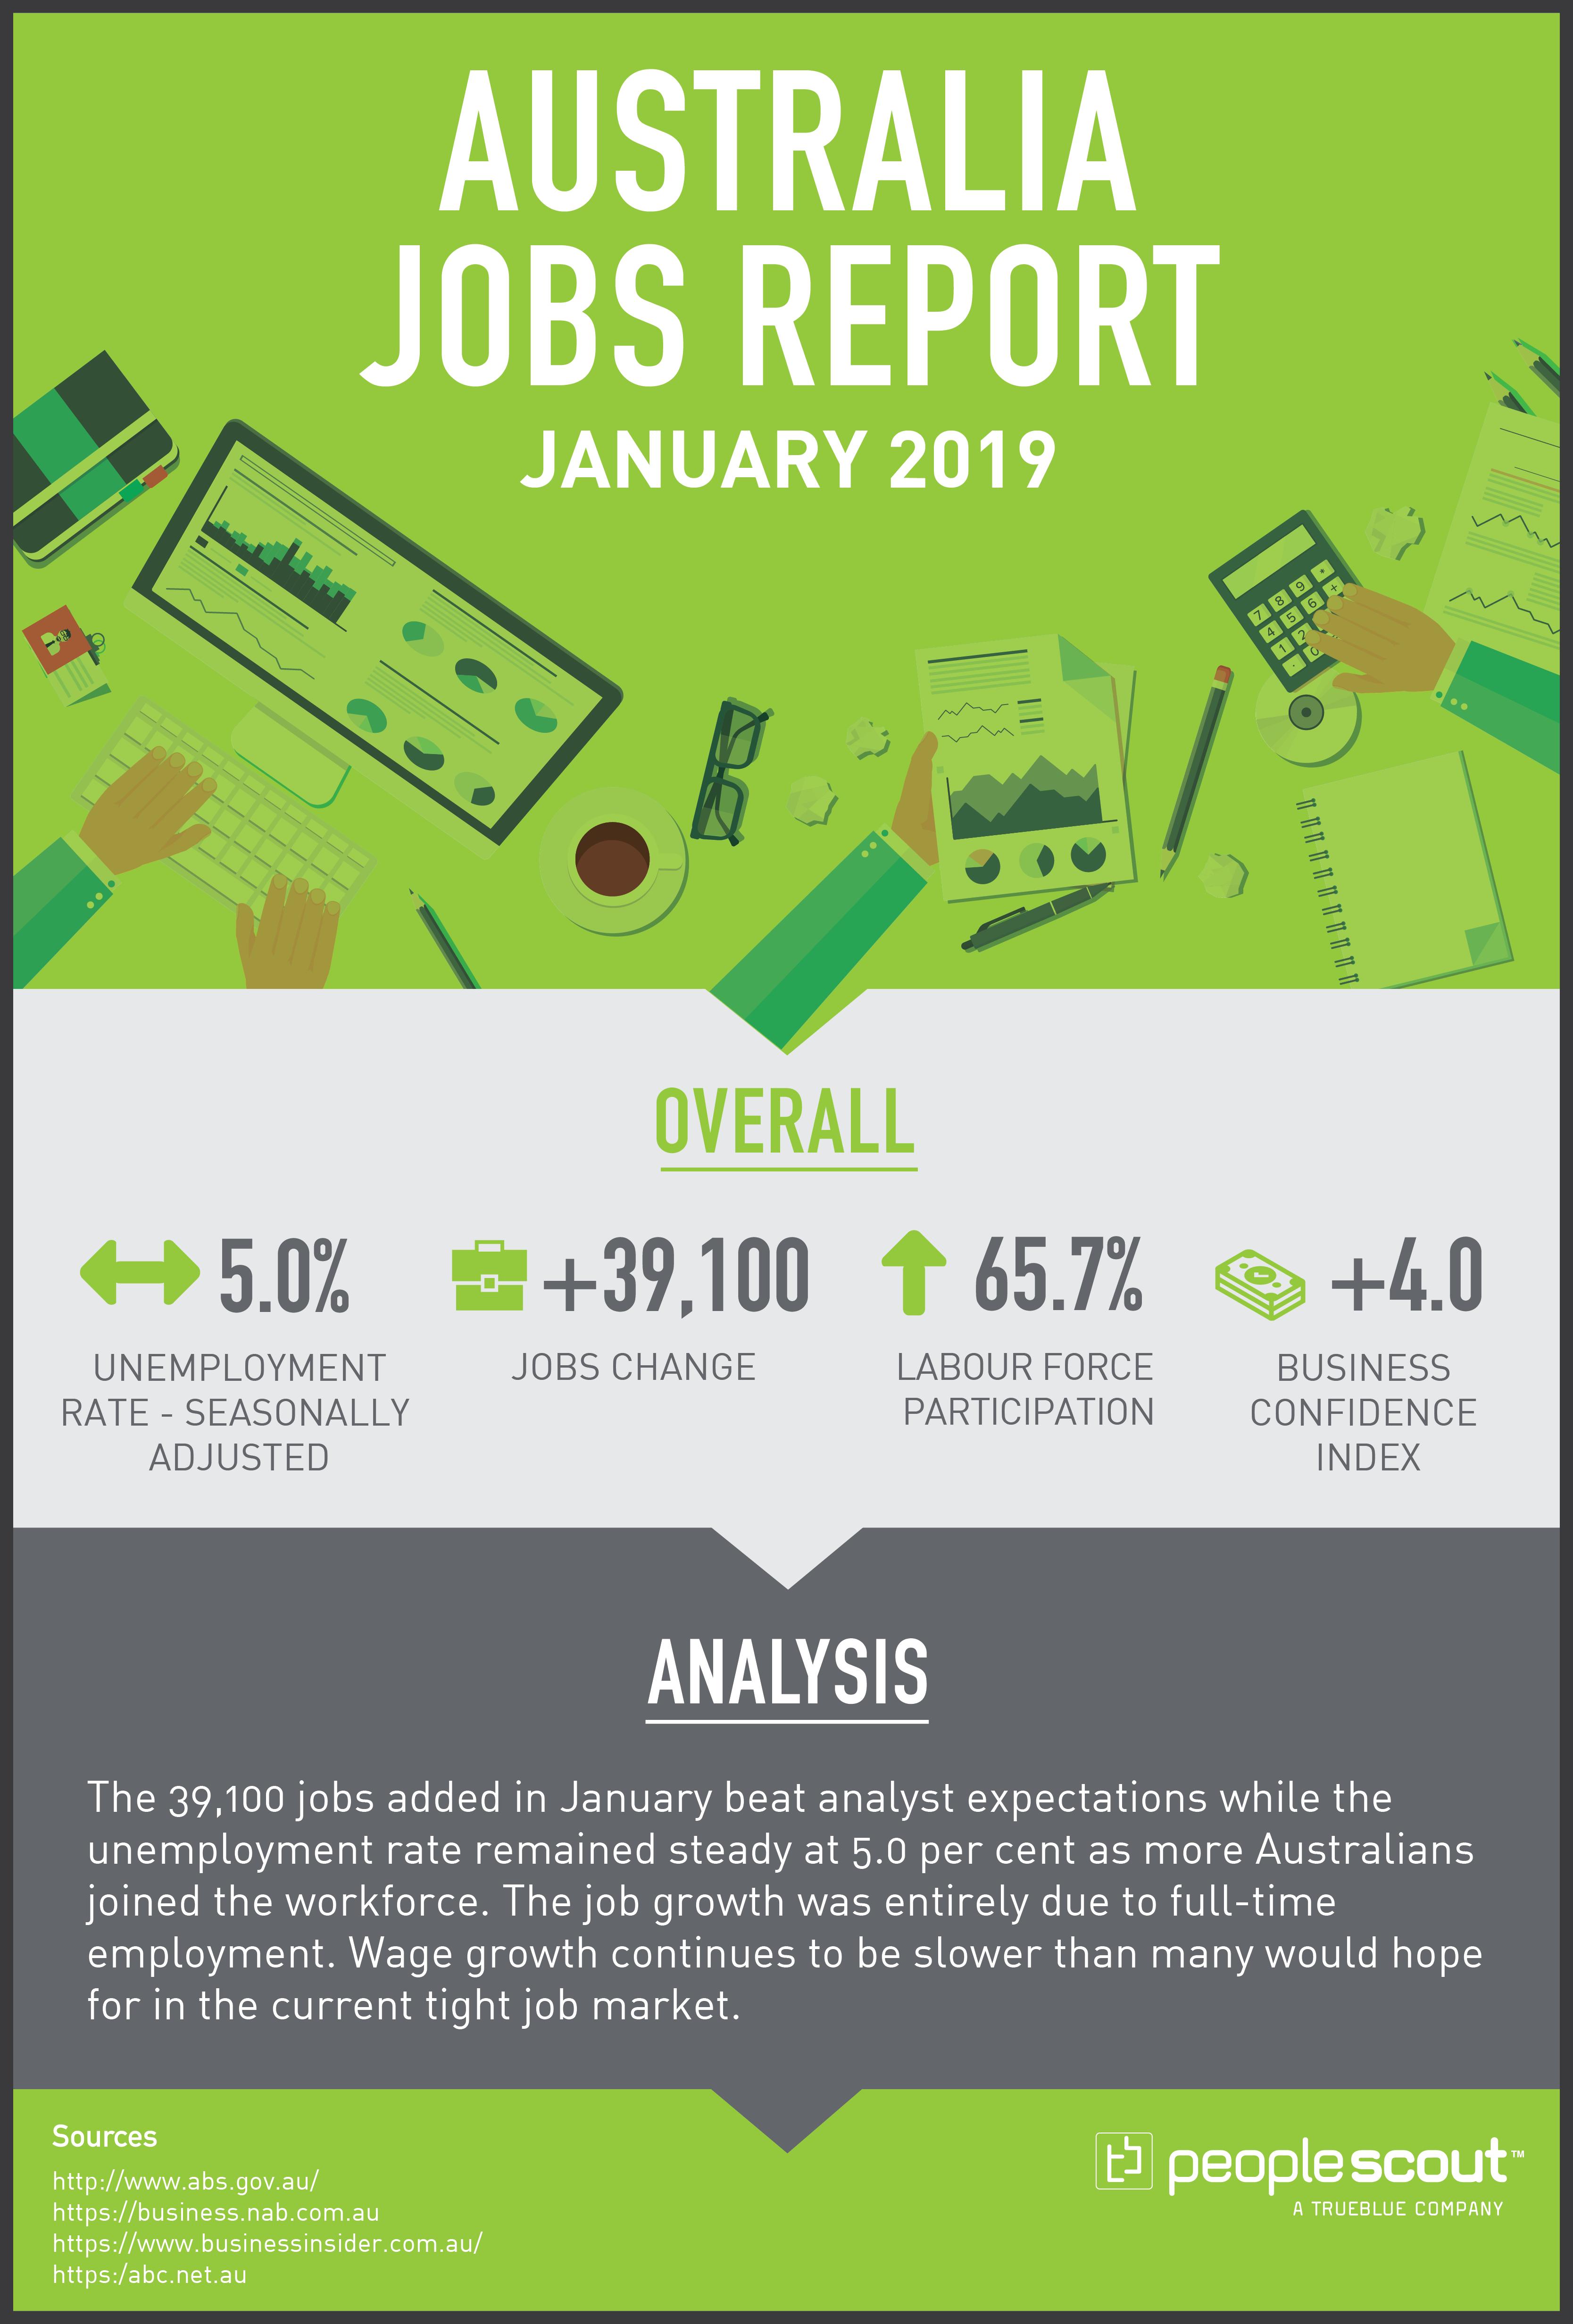 Australia Jobs Report January 2019